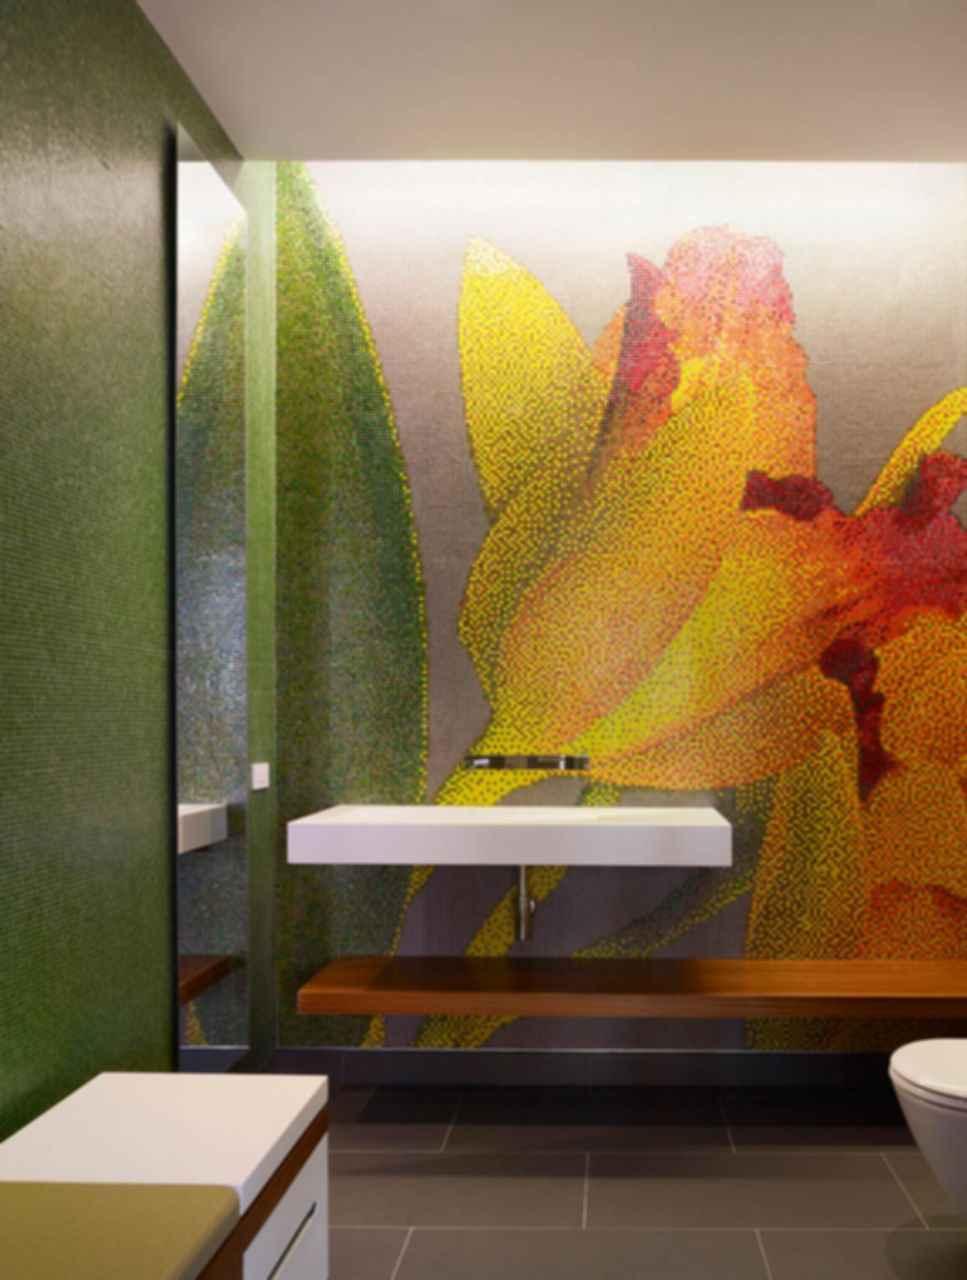 Kona Residence - Bathroom